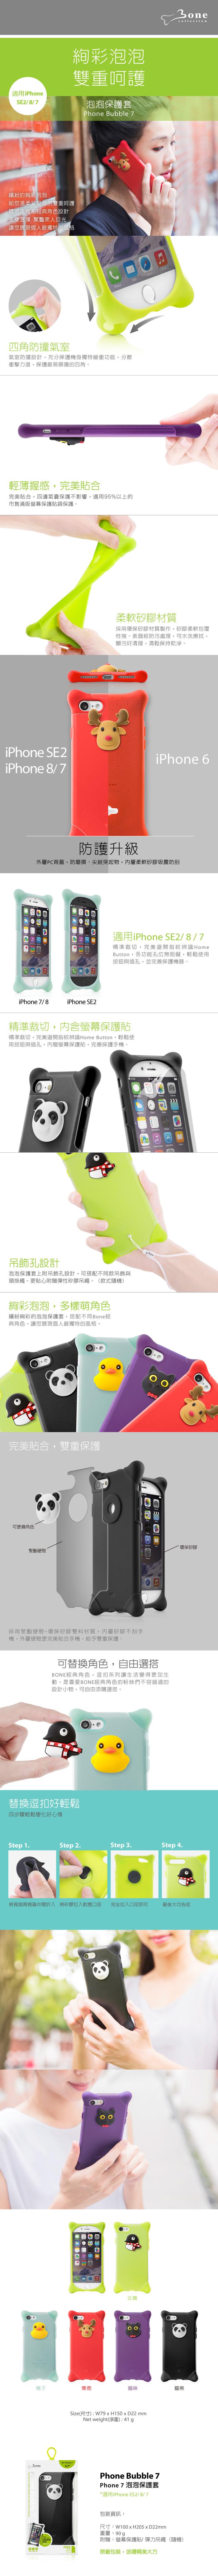 Bone iPhone SE2 / 8 / 7 四角防撞 泡泡保護套 - 麋鹿